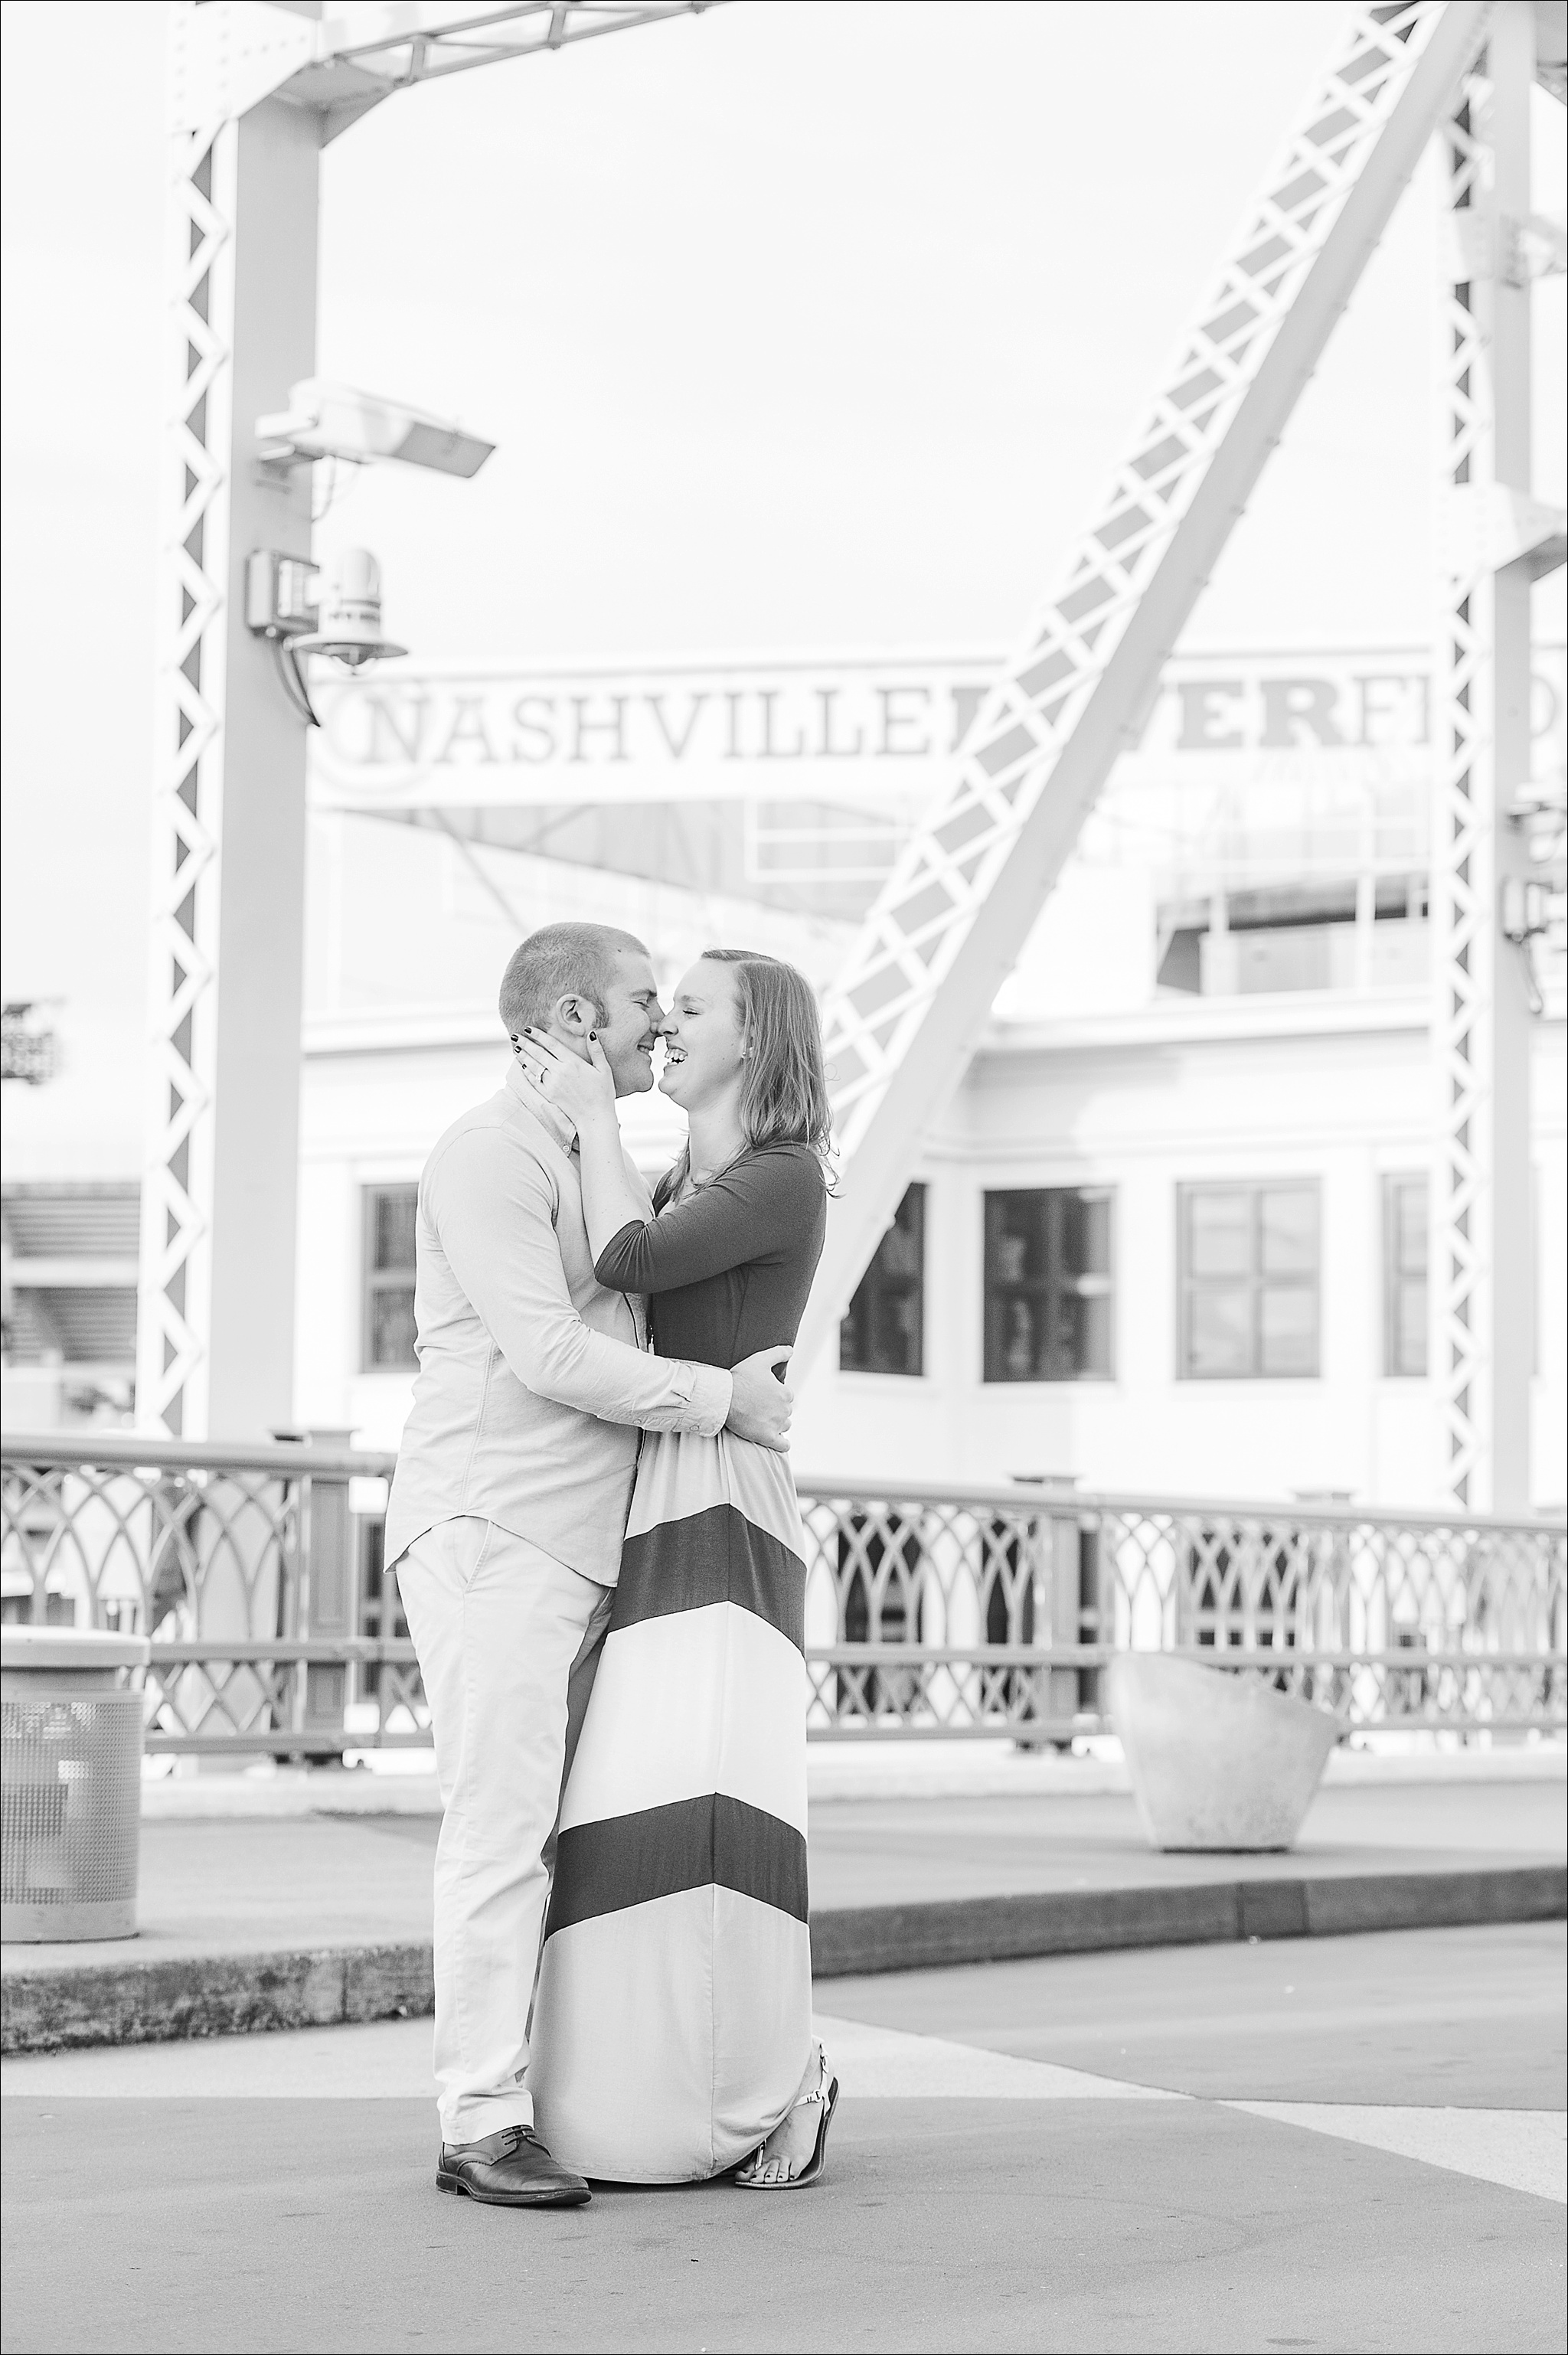 Rachel & Alex's Downtown Nashville Engagement Session by Heather Durham Photography